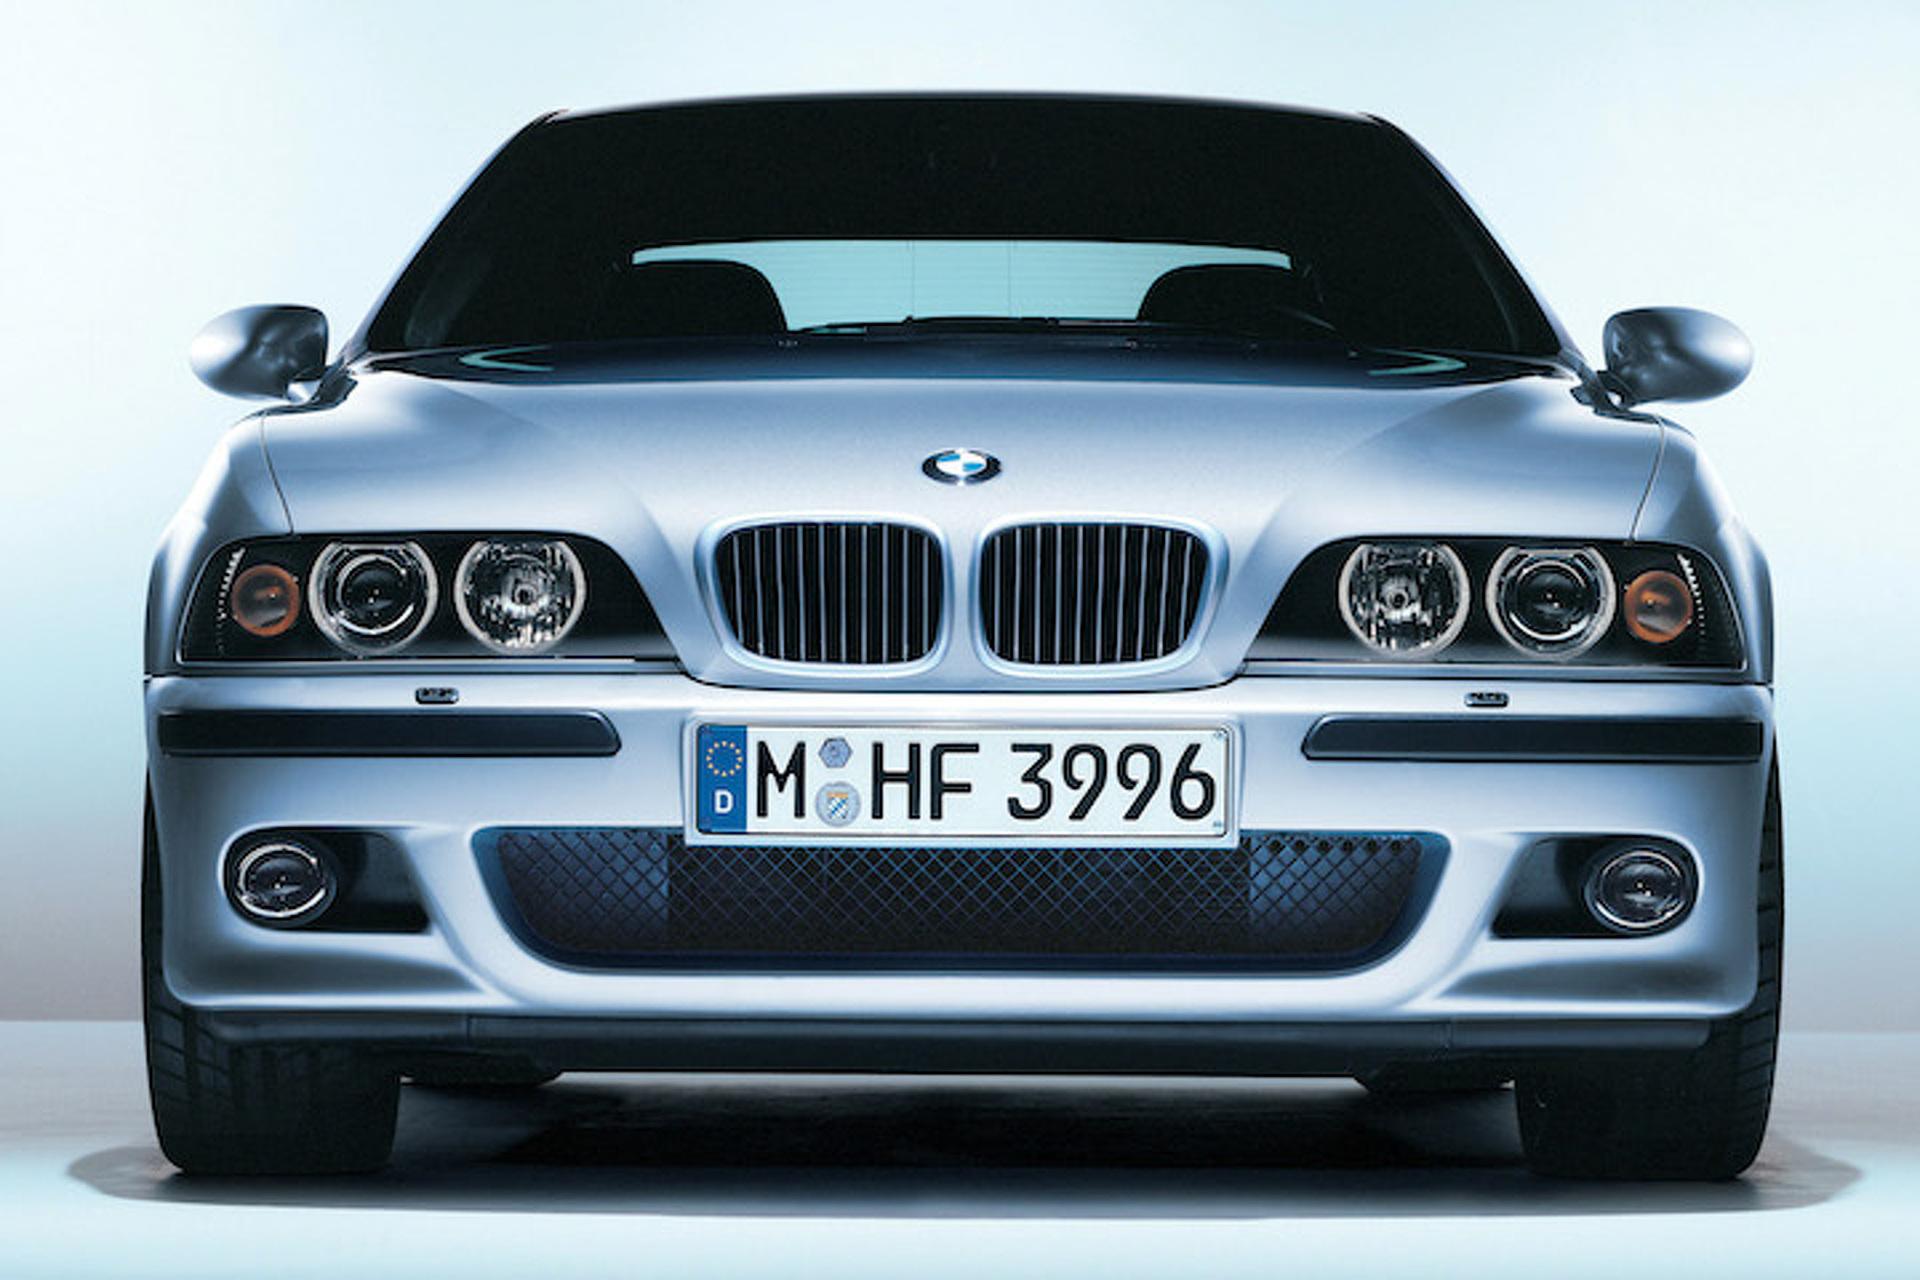 BMW M5: 30 Years and Still Kickin'